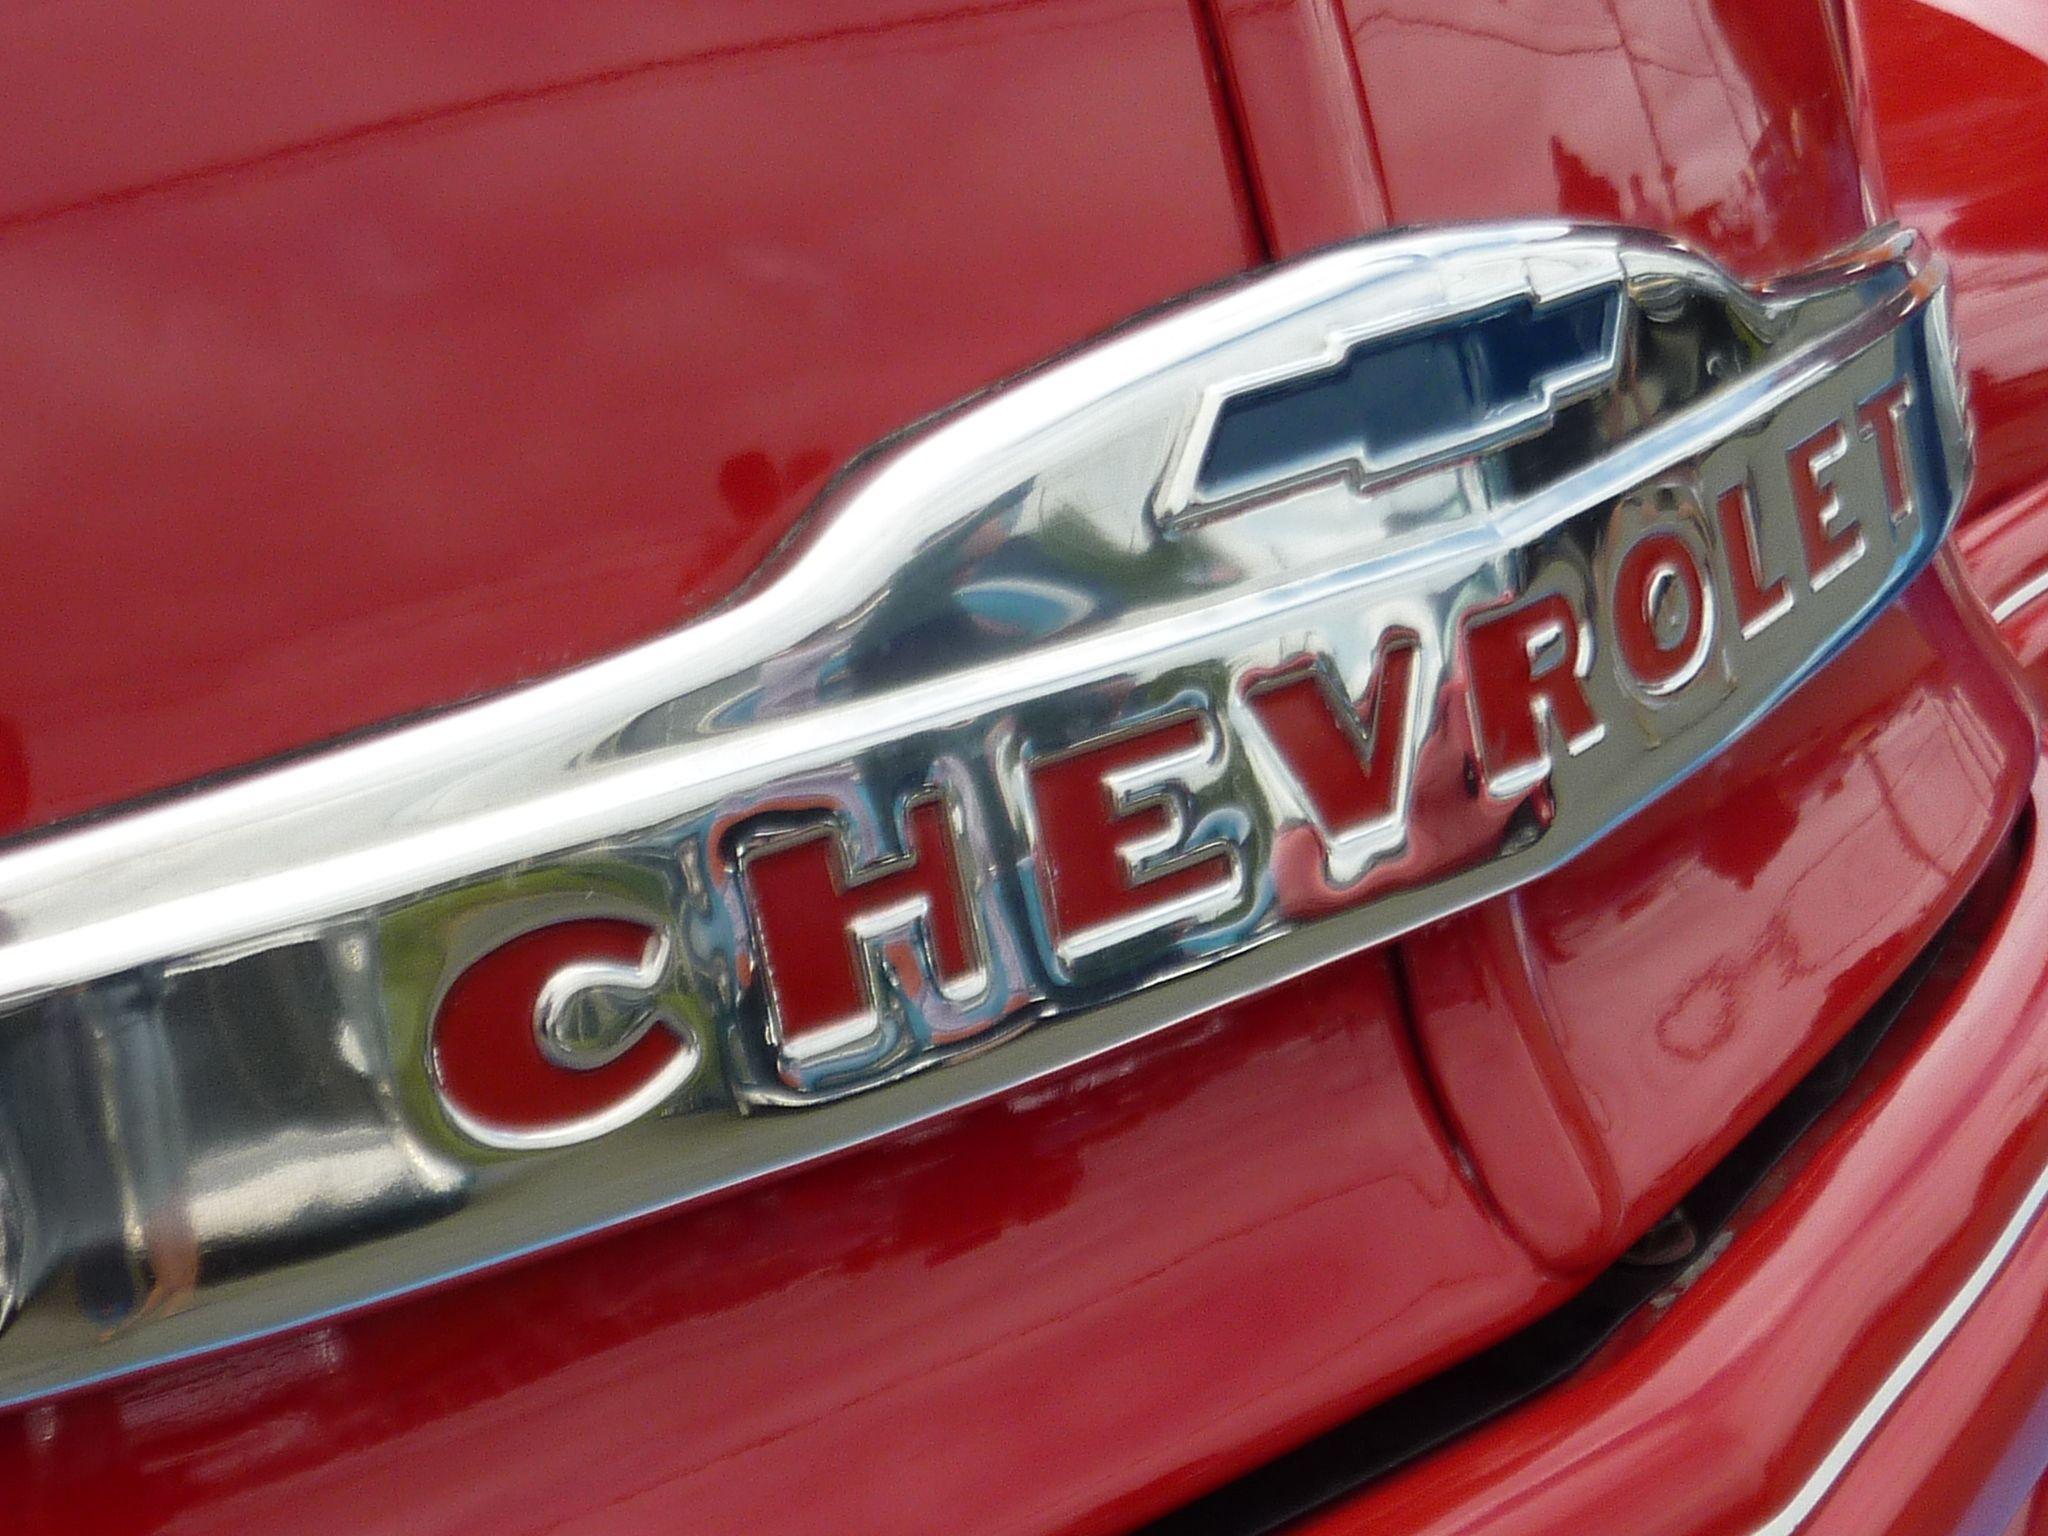 chevrolet emblem cars to dream about pinterest. Black Bedroom Furniture Sets. Home Design Ideas